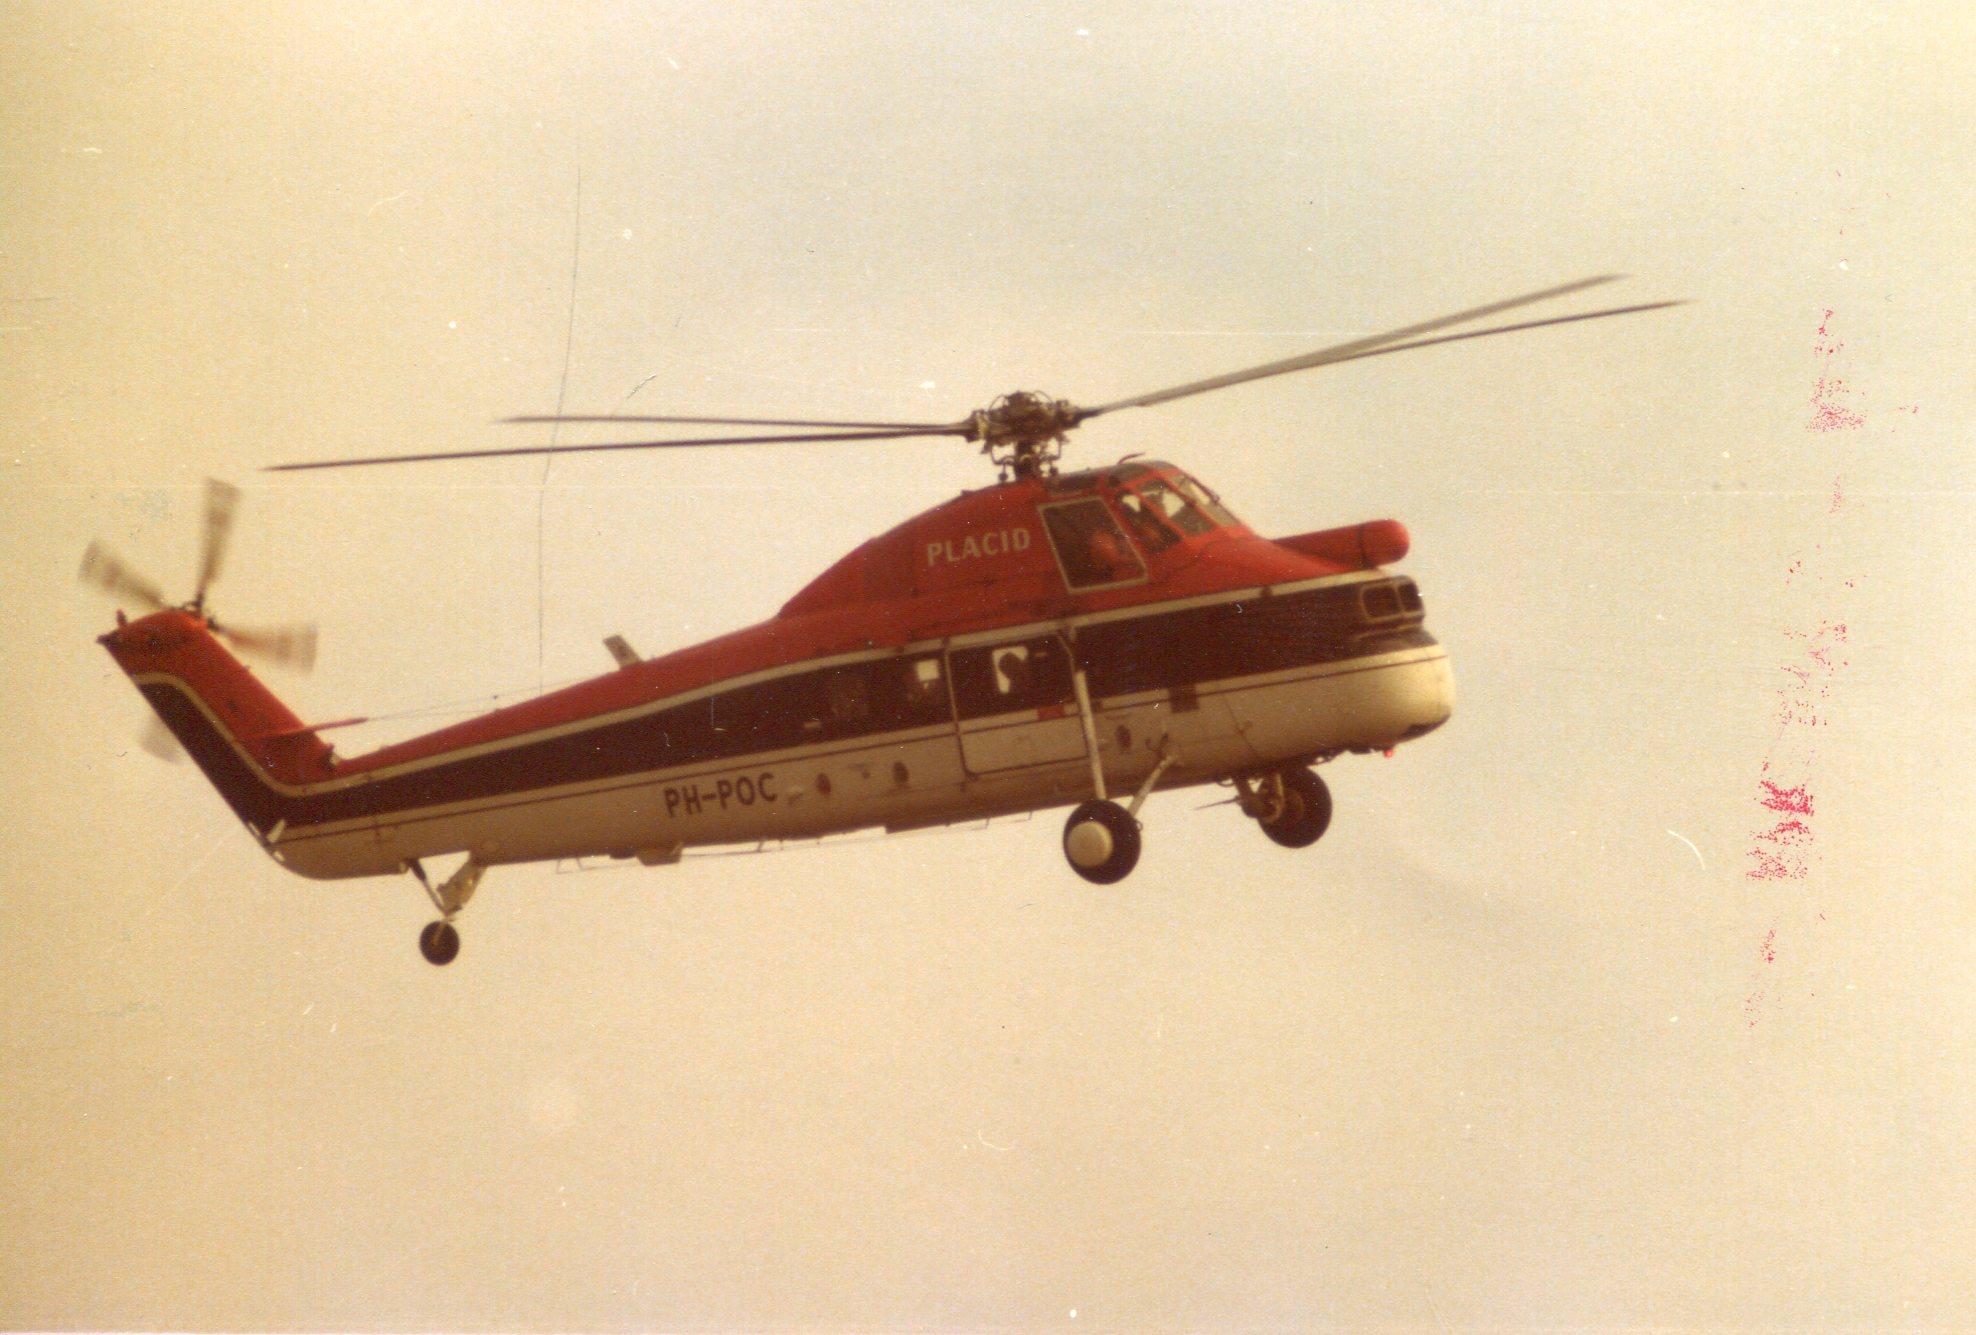 Naam: Den Helder , april 1977 (3).jpg Bekeken: 395 Grootte: 334,4 KB